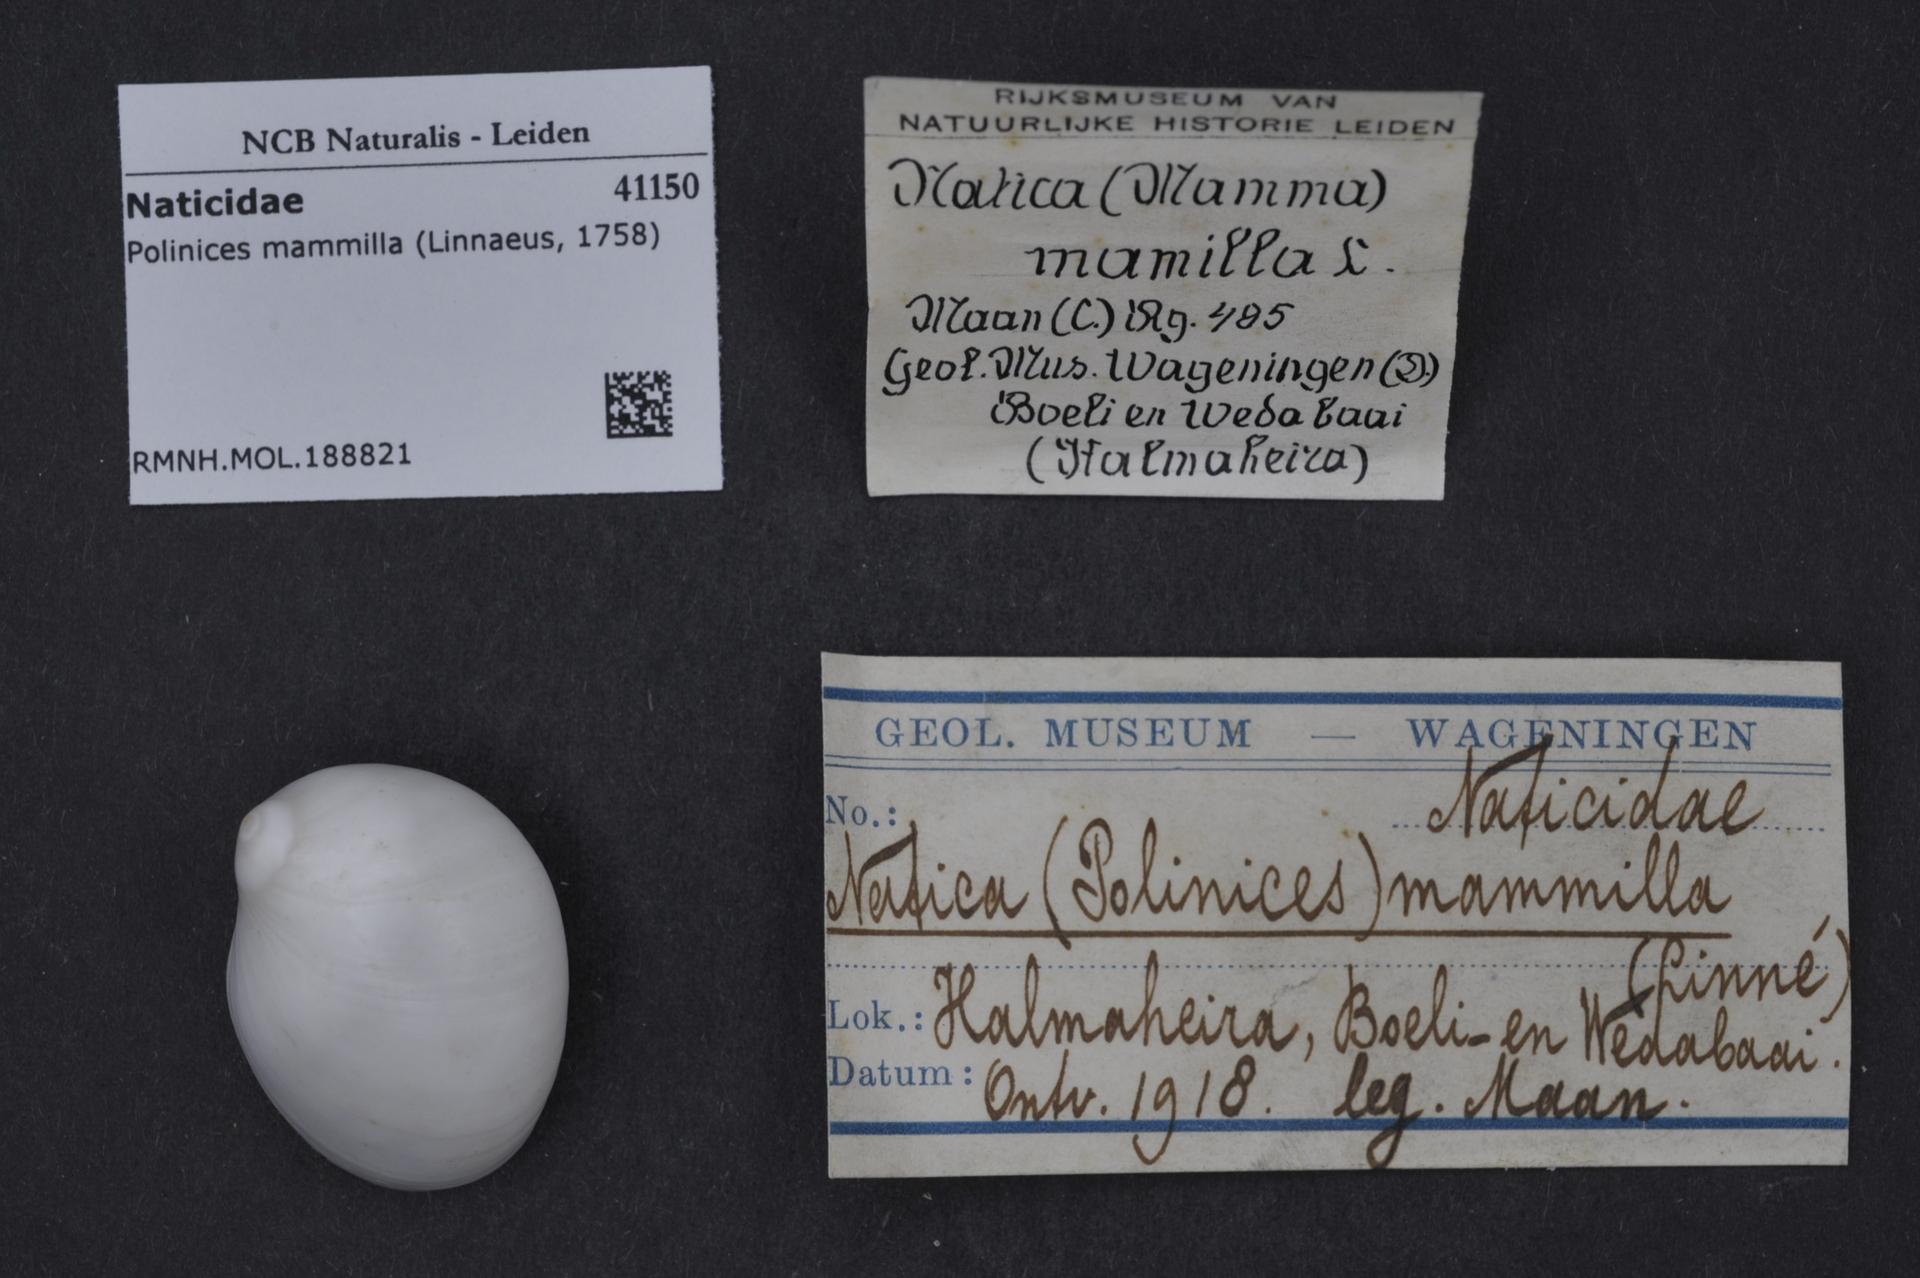 RMNH.MOL.188821 | Polinices mammilla (Linnaeus, 1758)